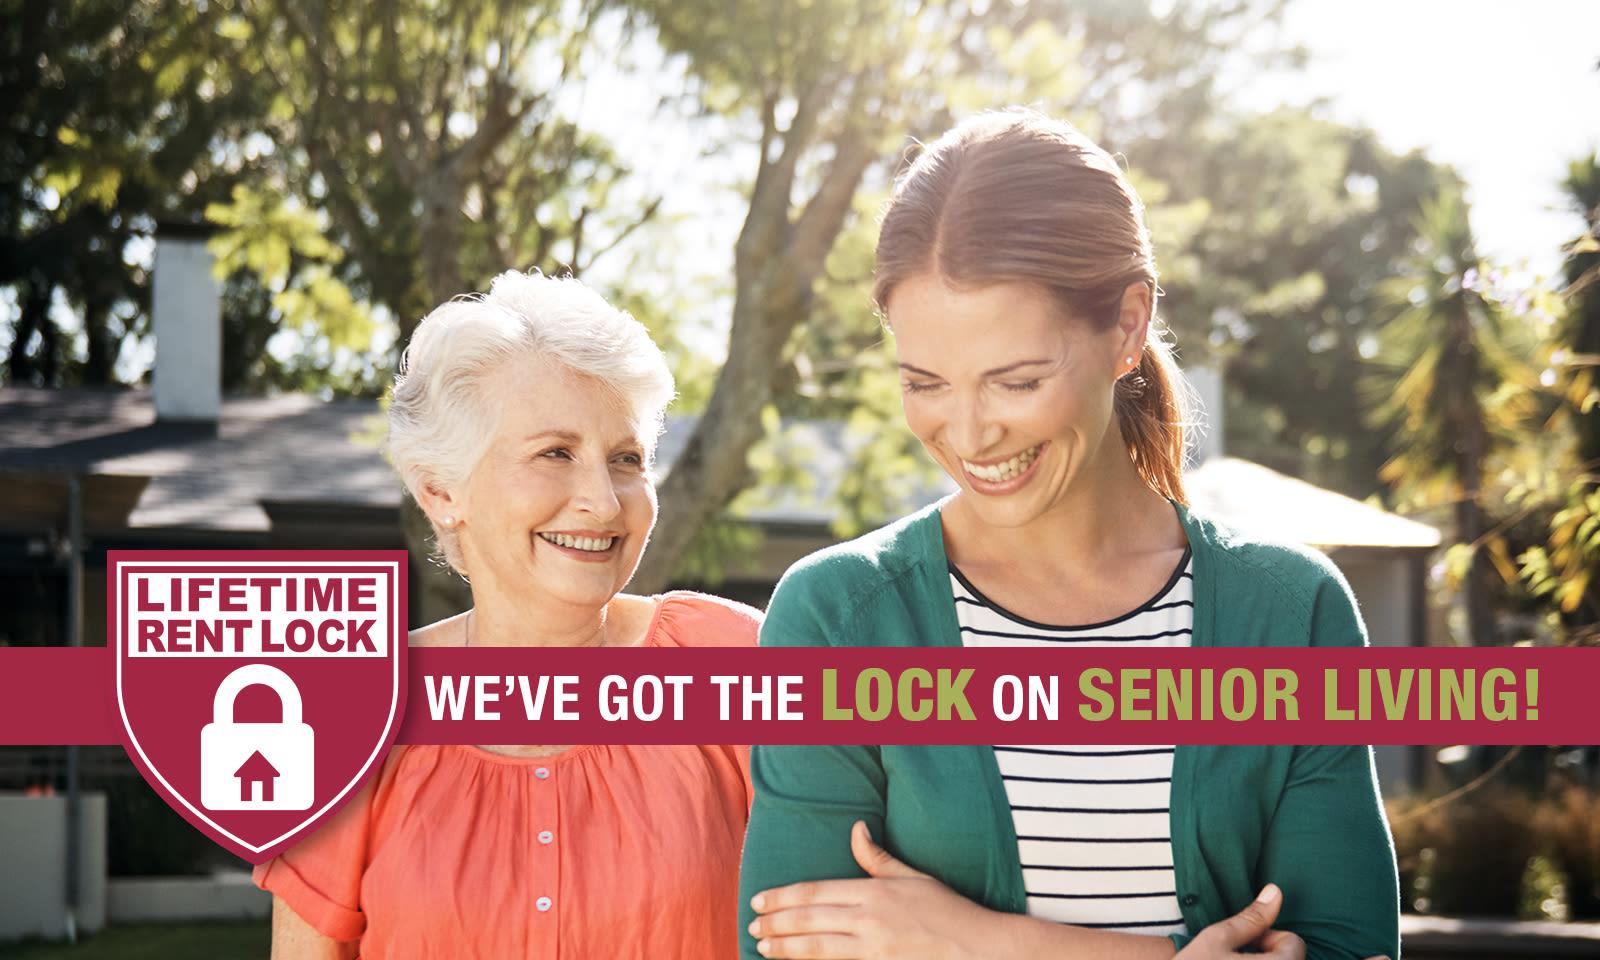 Allentown senior living has amazing care options